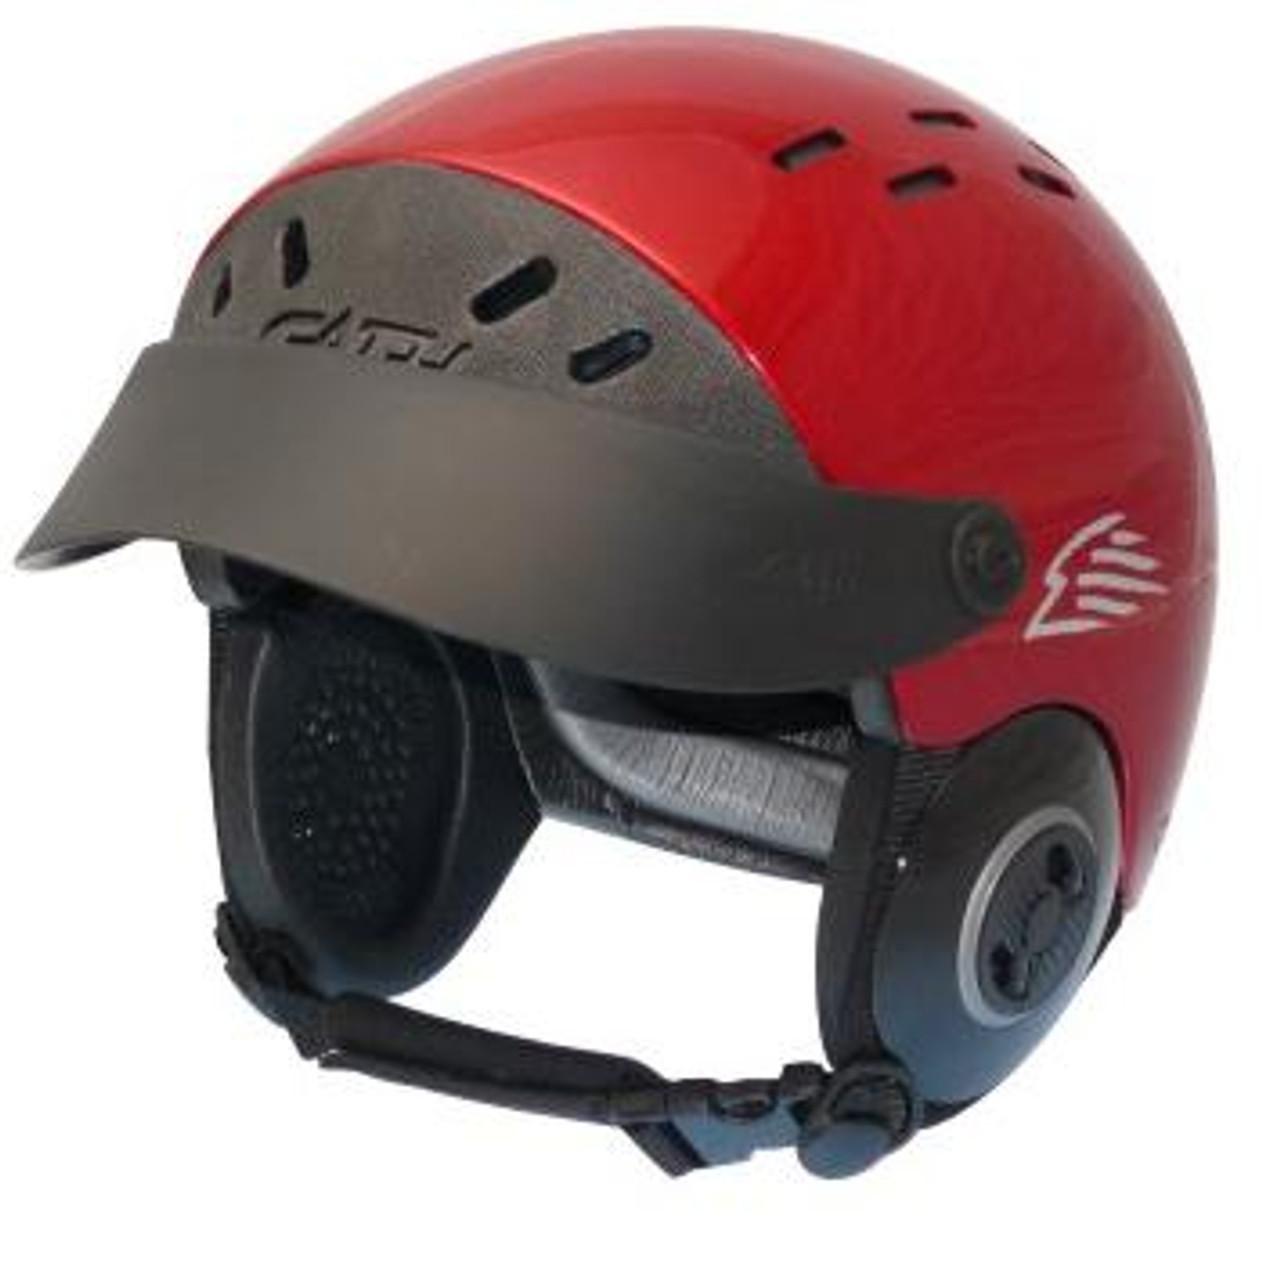 Gath Helmet with SFC Peak (sold separately)